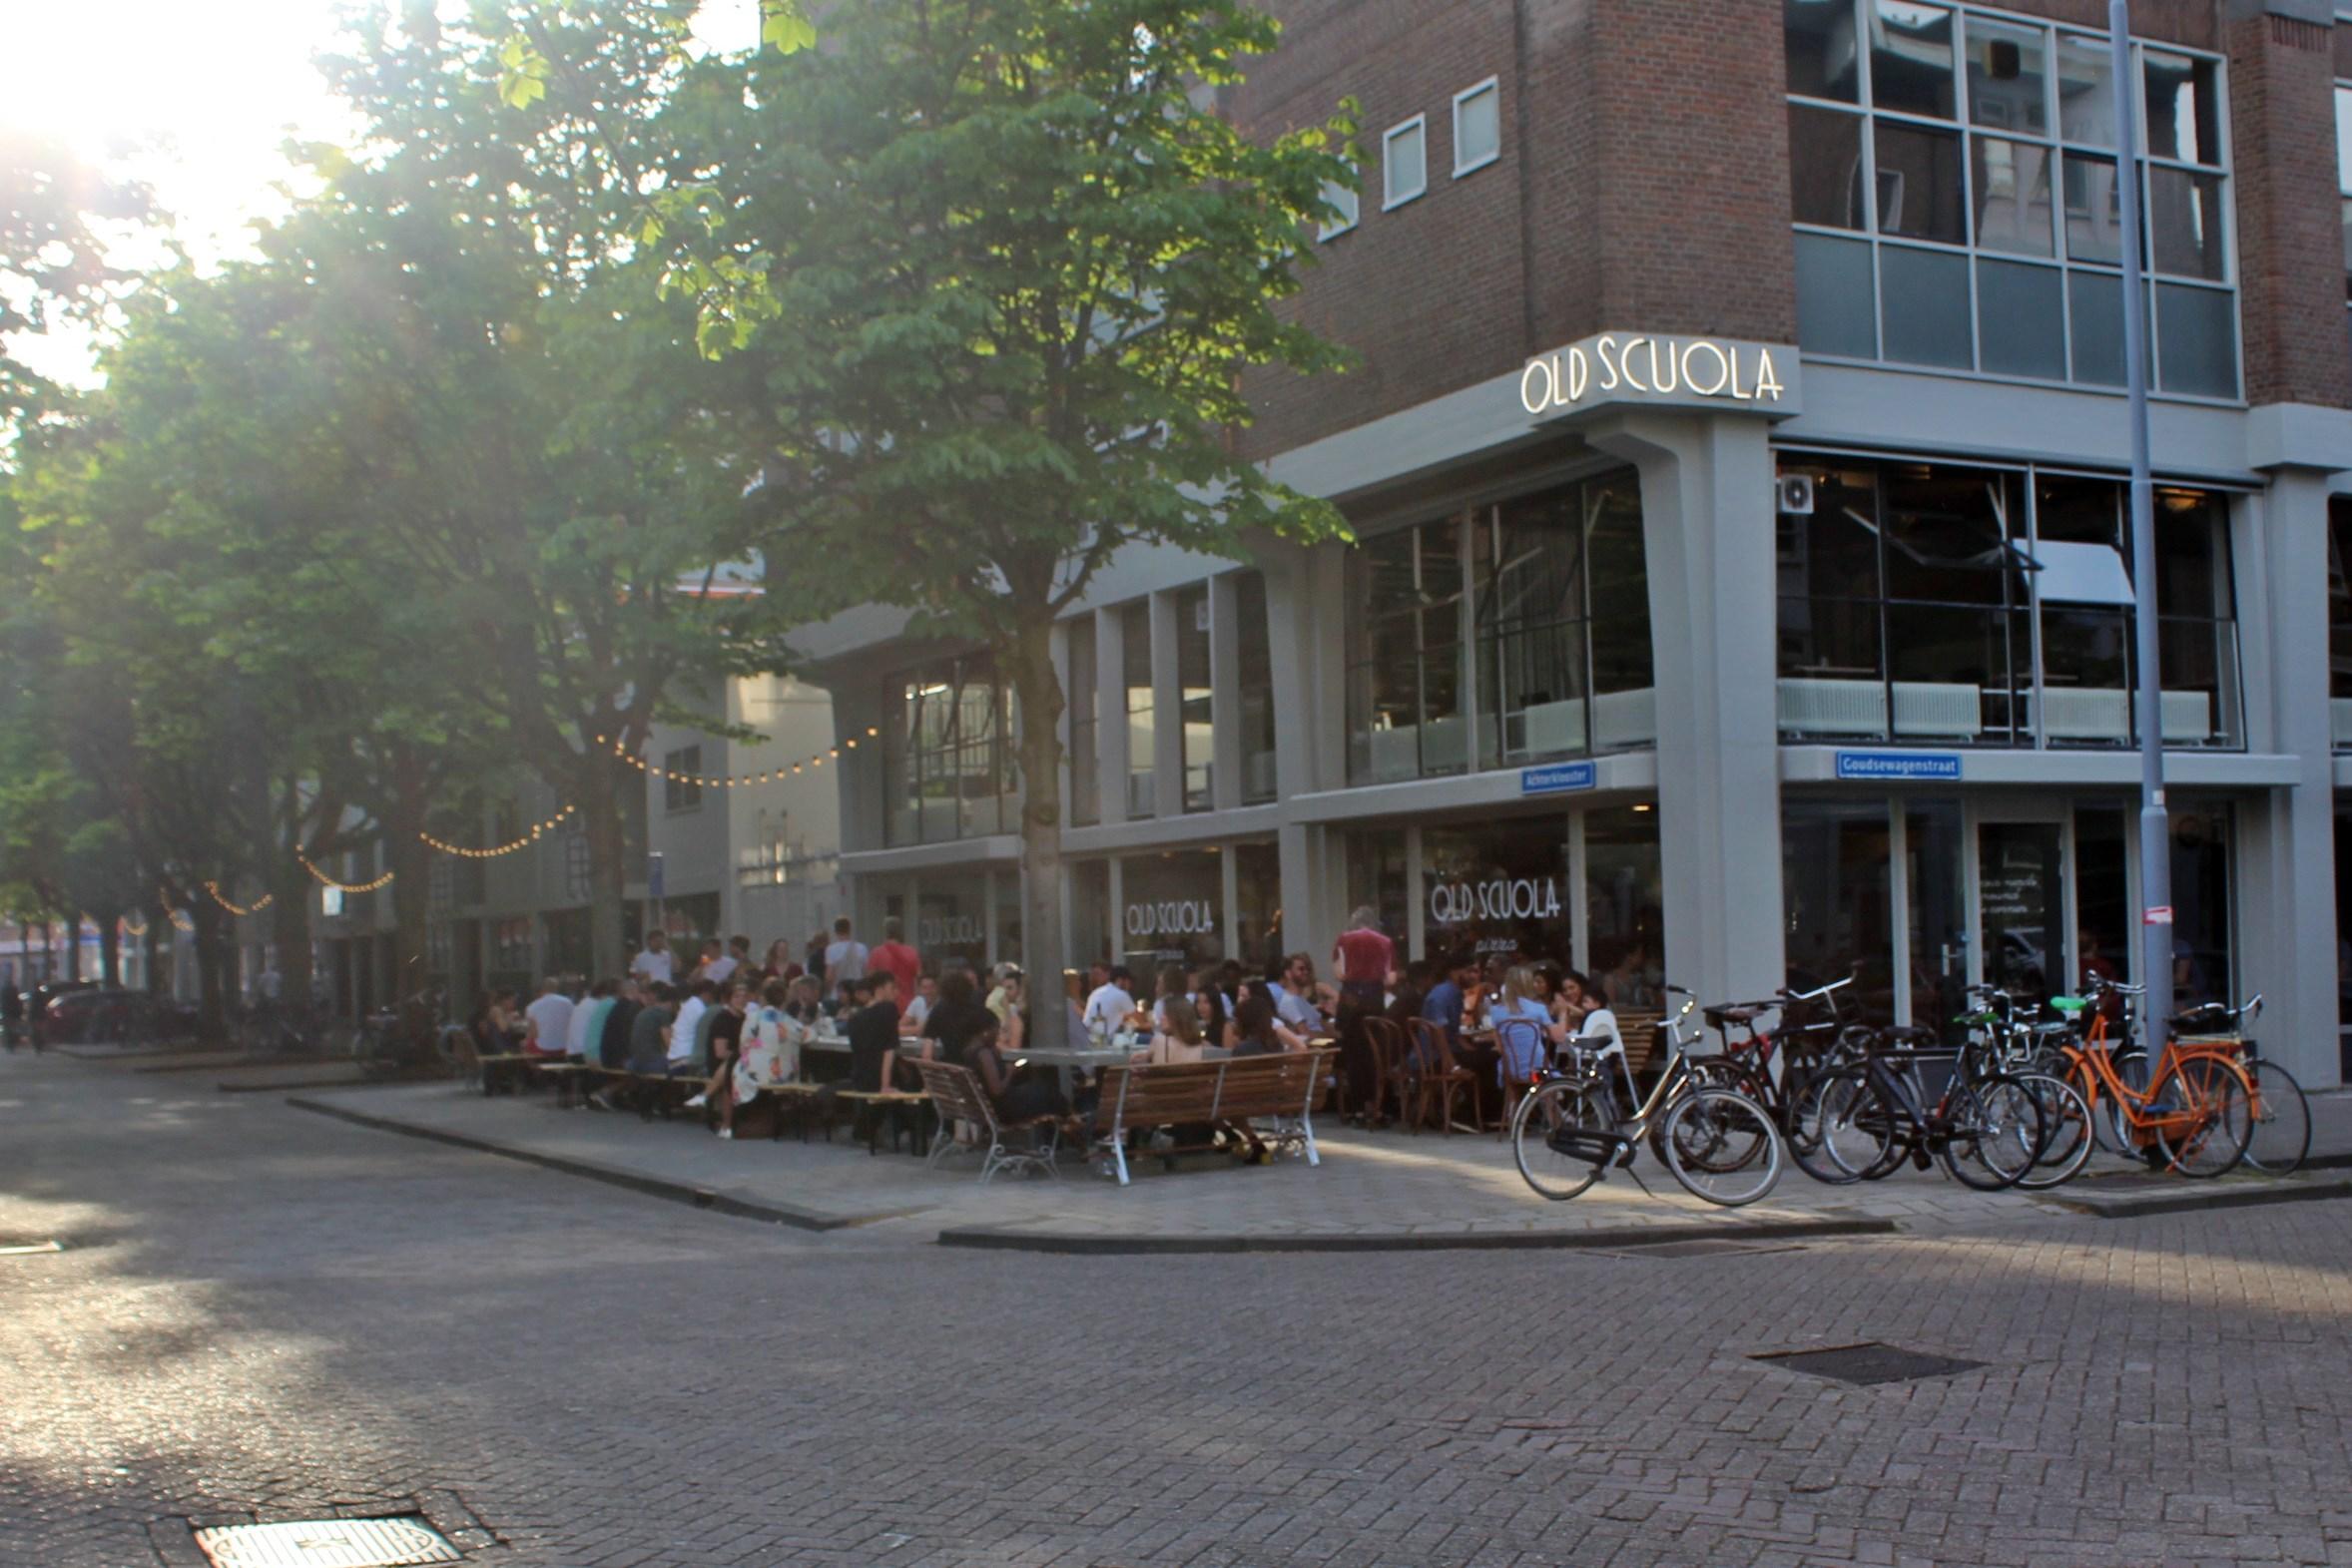 Old-Scuola-Rotterdam-9.jpg